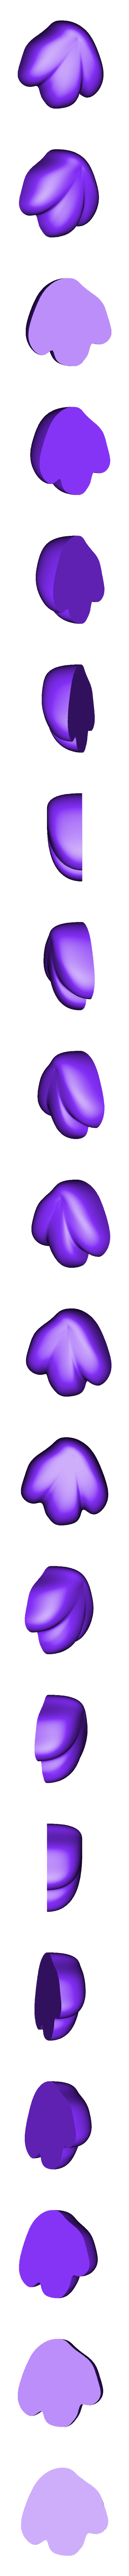 feet right yellow.stl Télécharger fichier STL gratuit Tuxedo Sam (l'ami de Hello Kitty) Pingouin (タキシードサム, Takishīdosamu) • Objet pour impression 3D, Jangie